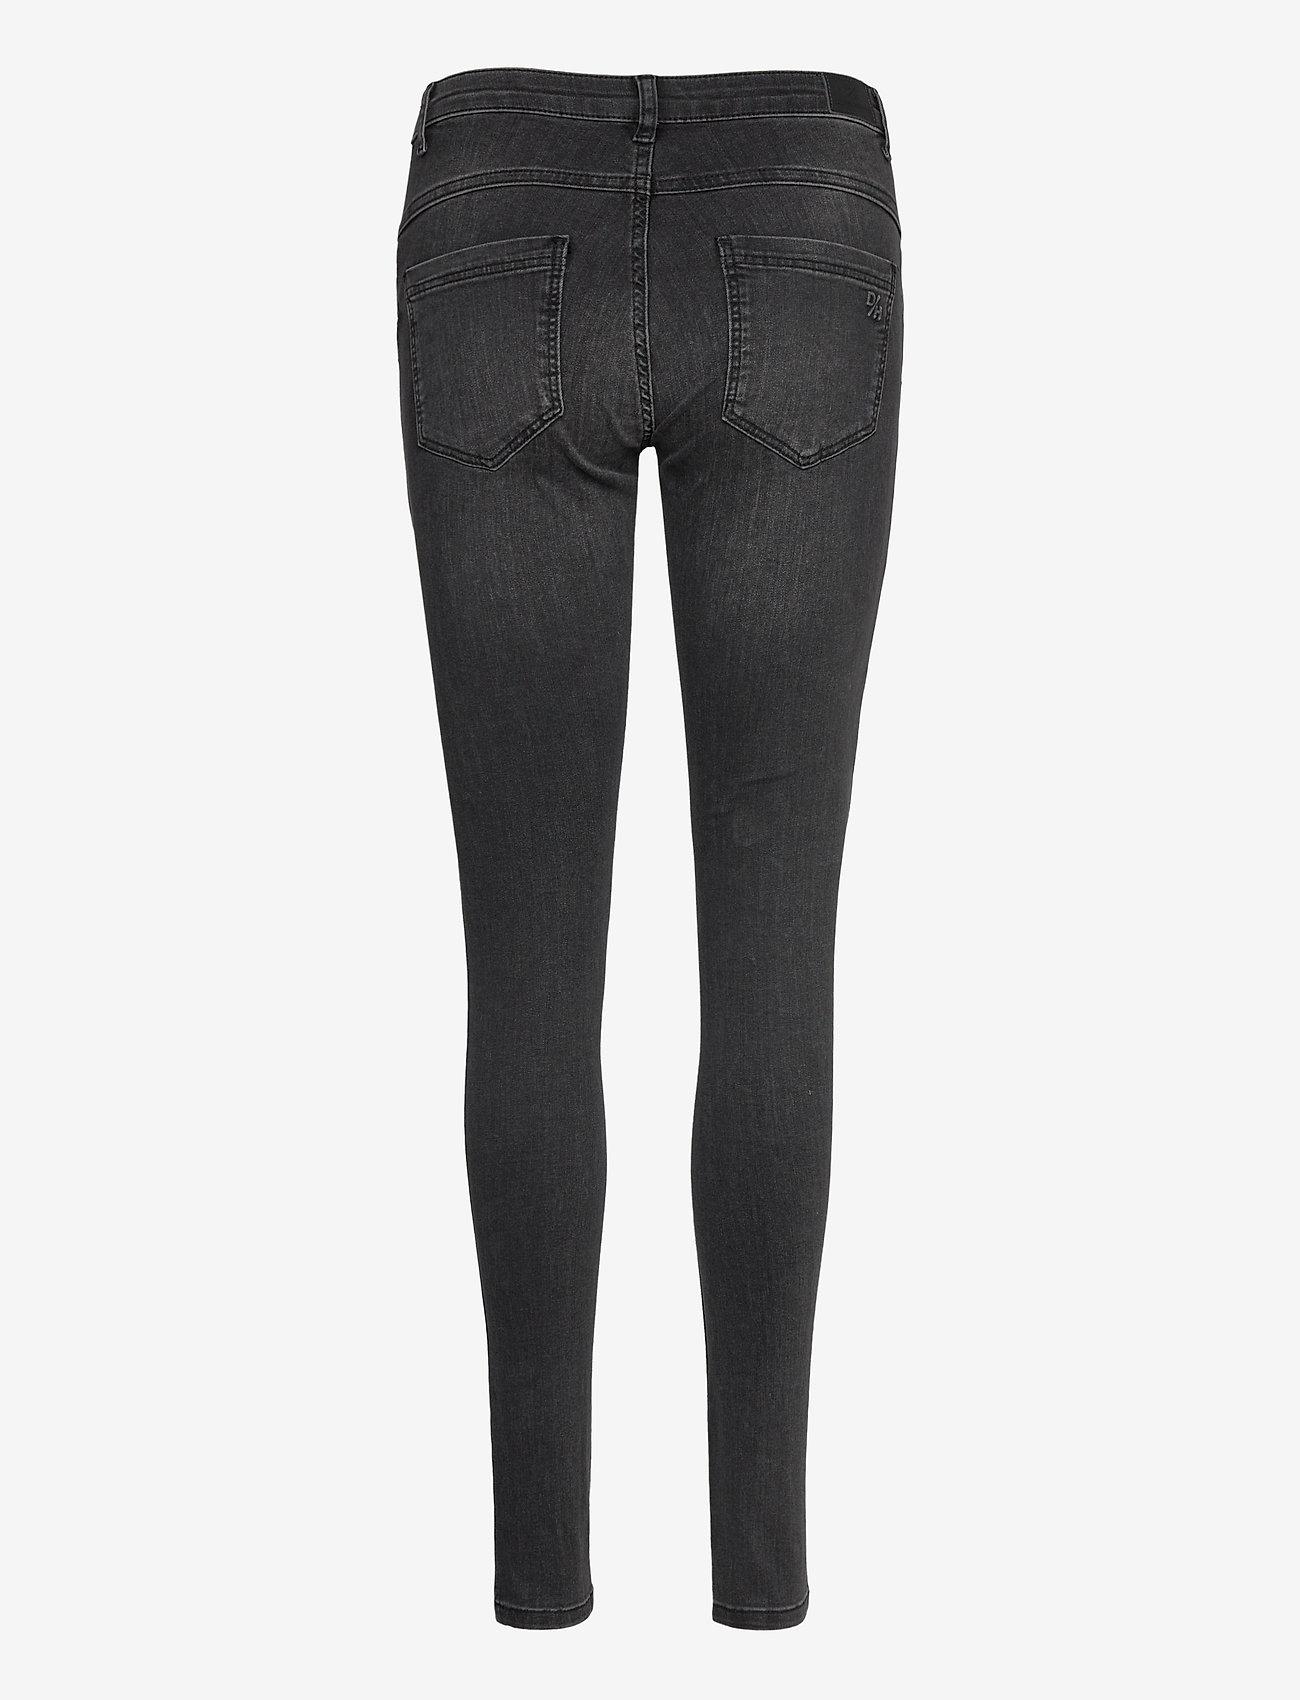 Denim Hunter - 32 THE CELINA LONG CUSTOM - slim jeans - medium grey wash - 1